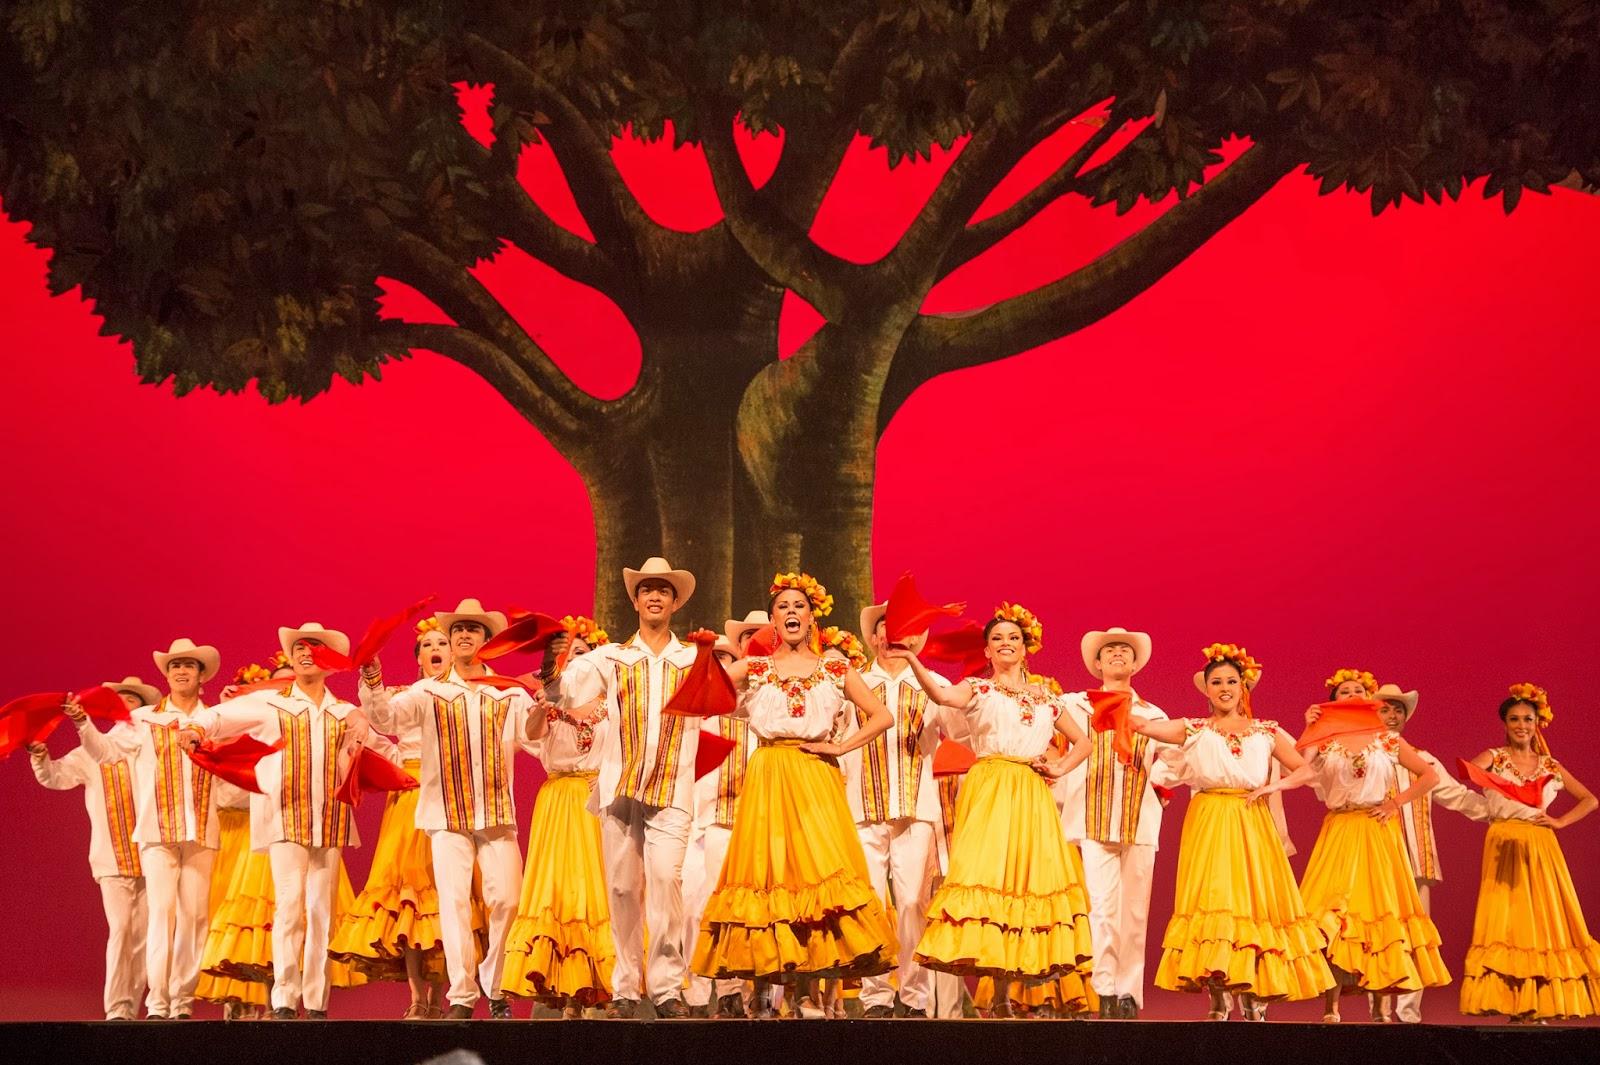 Ballet Folklorico Amalia Hernandez07.jpg